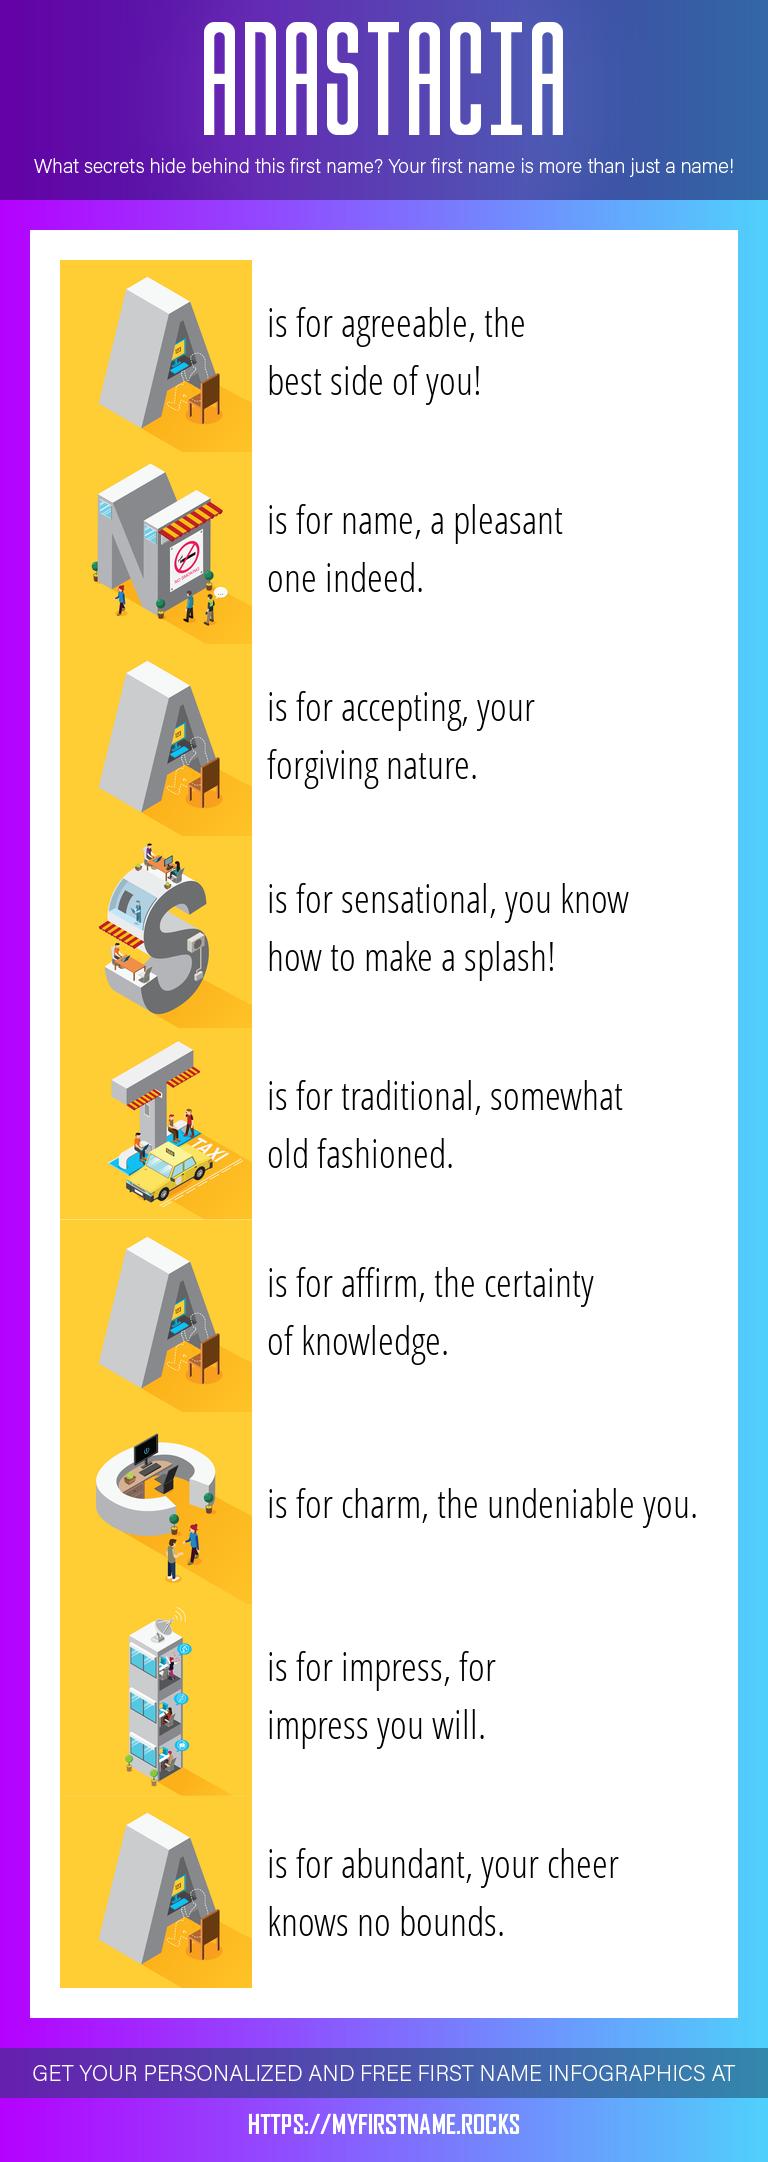 Anastacia Infographics